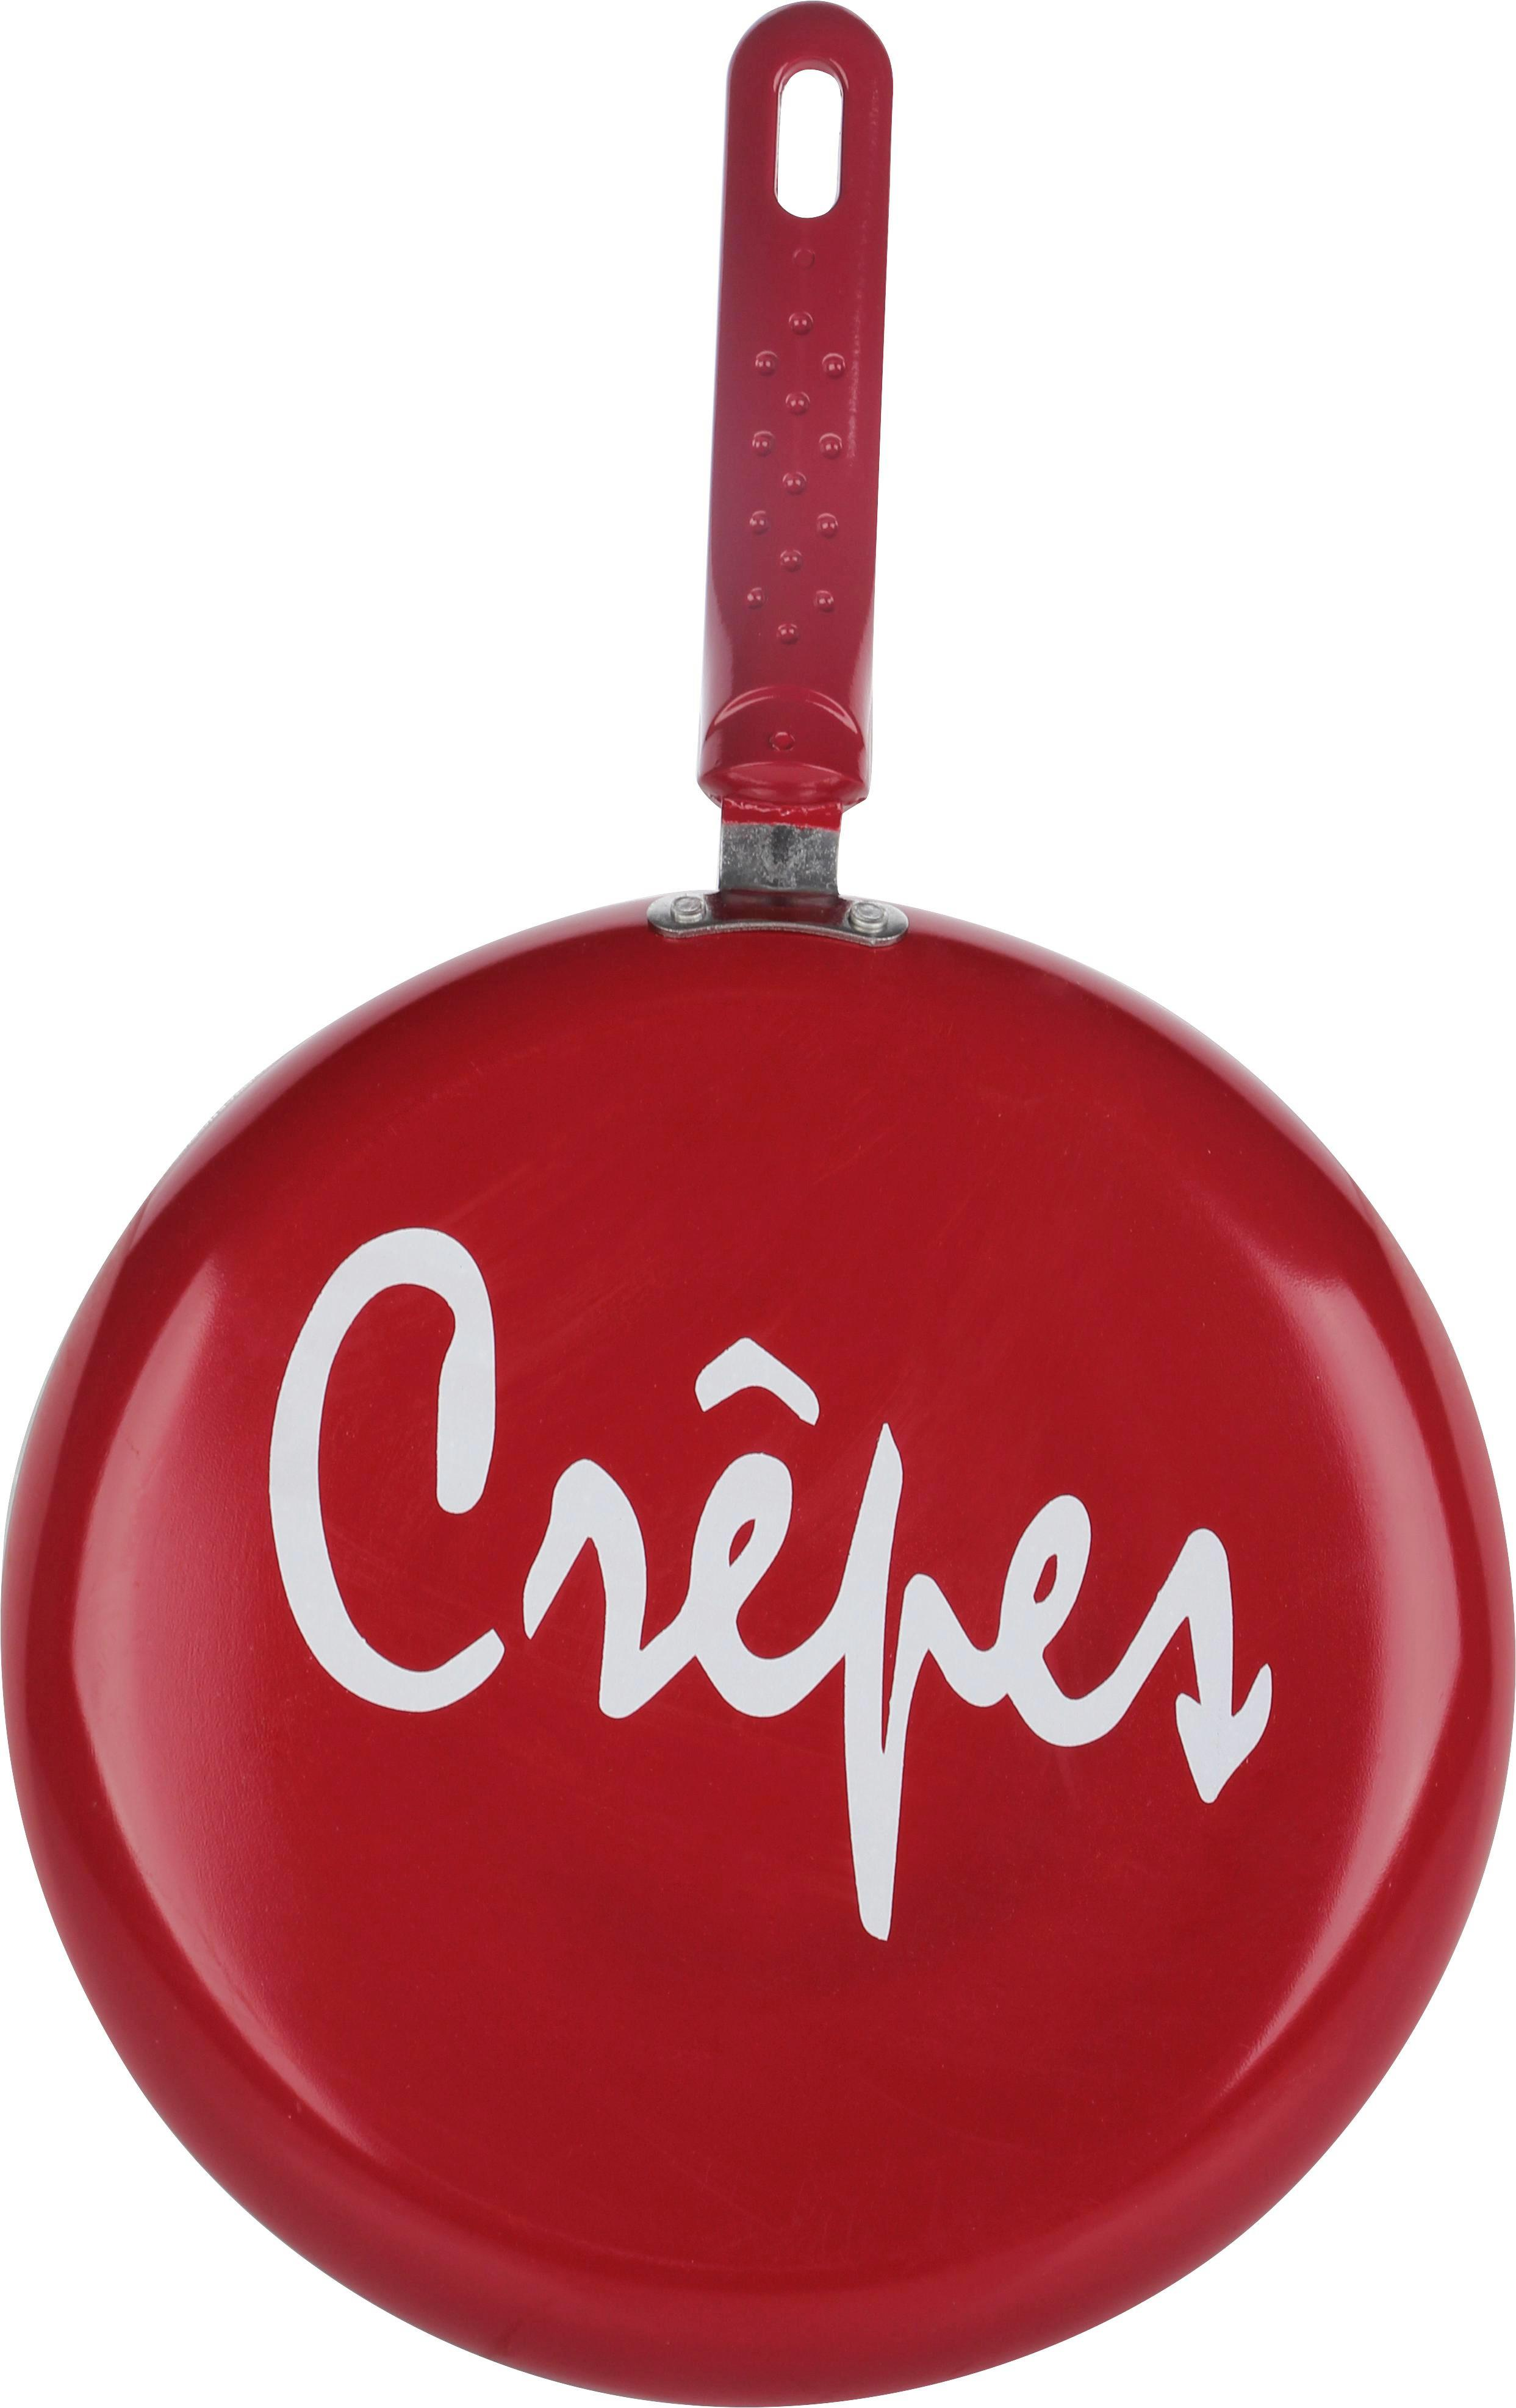 Crepespfanne Sherry in Rot - Rot, Kunststoff/Metall (26/2cm) - MÖMAX modern living